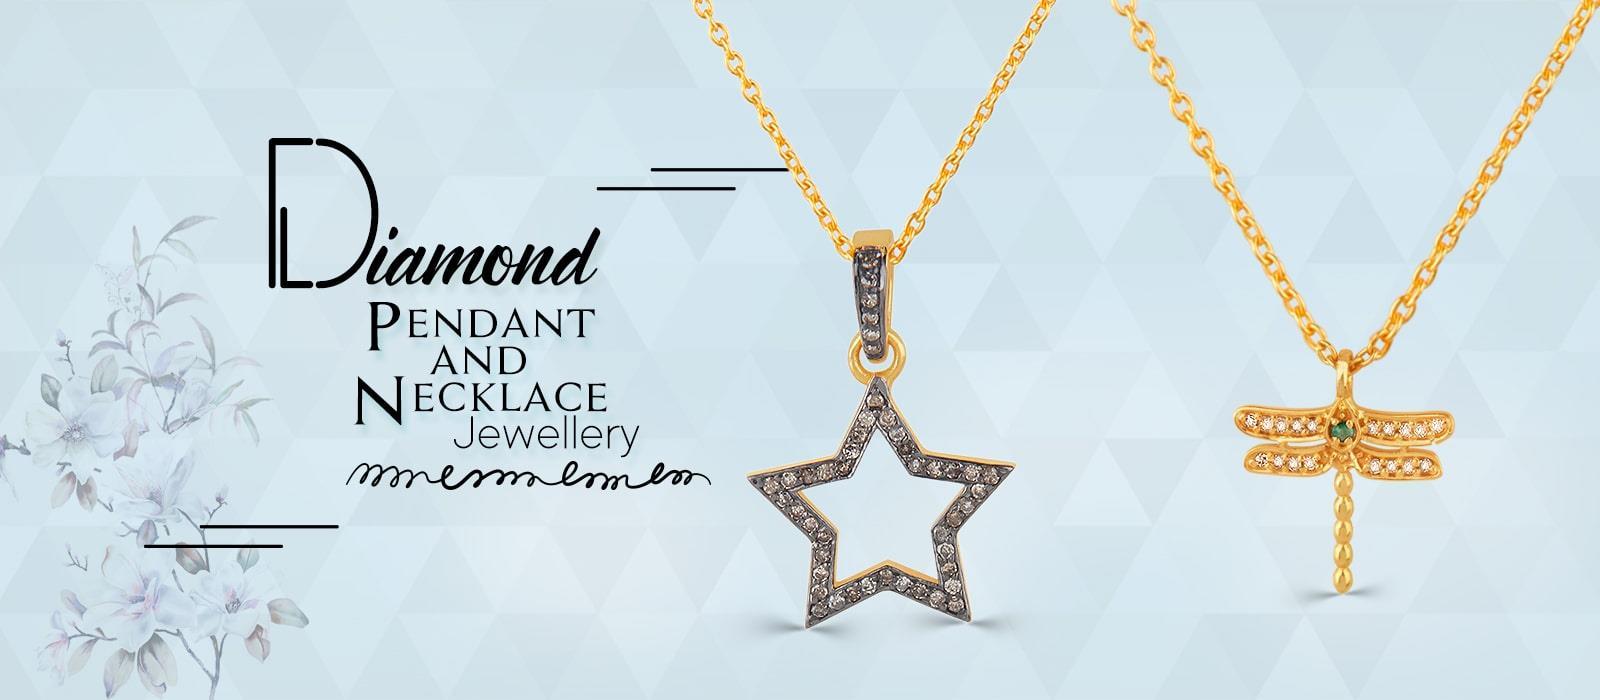 diamond pendant and necklace jewelry